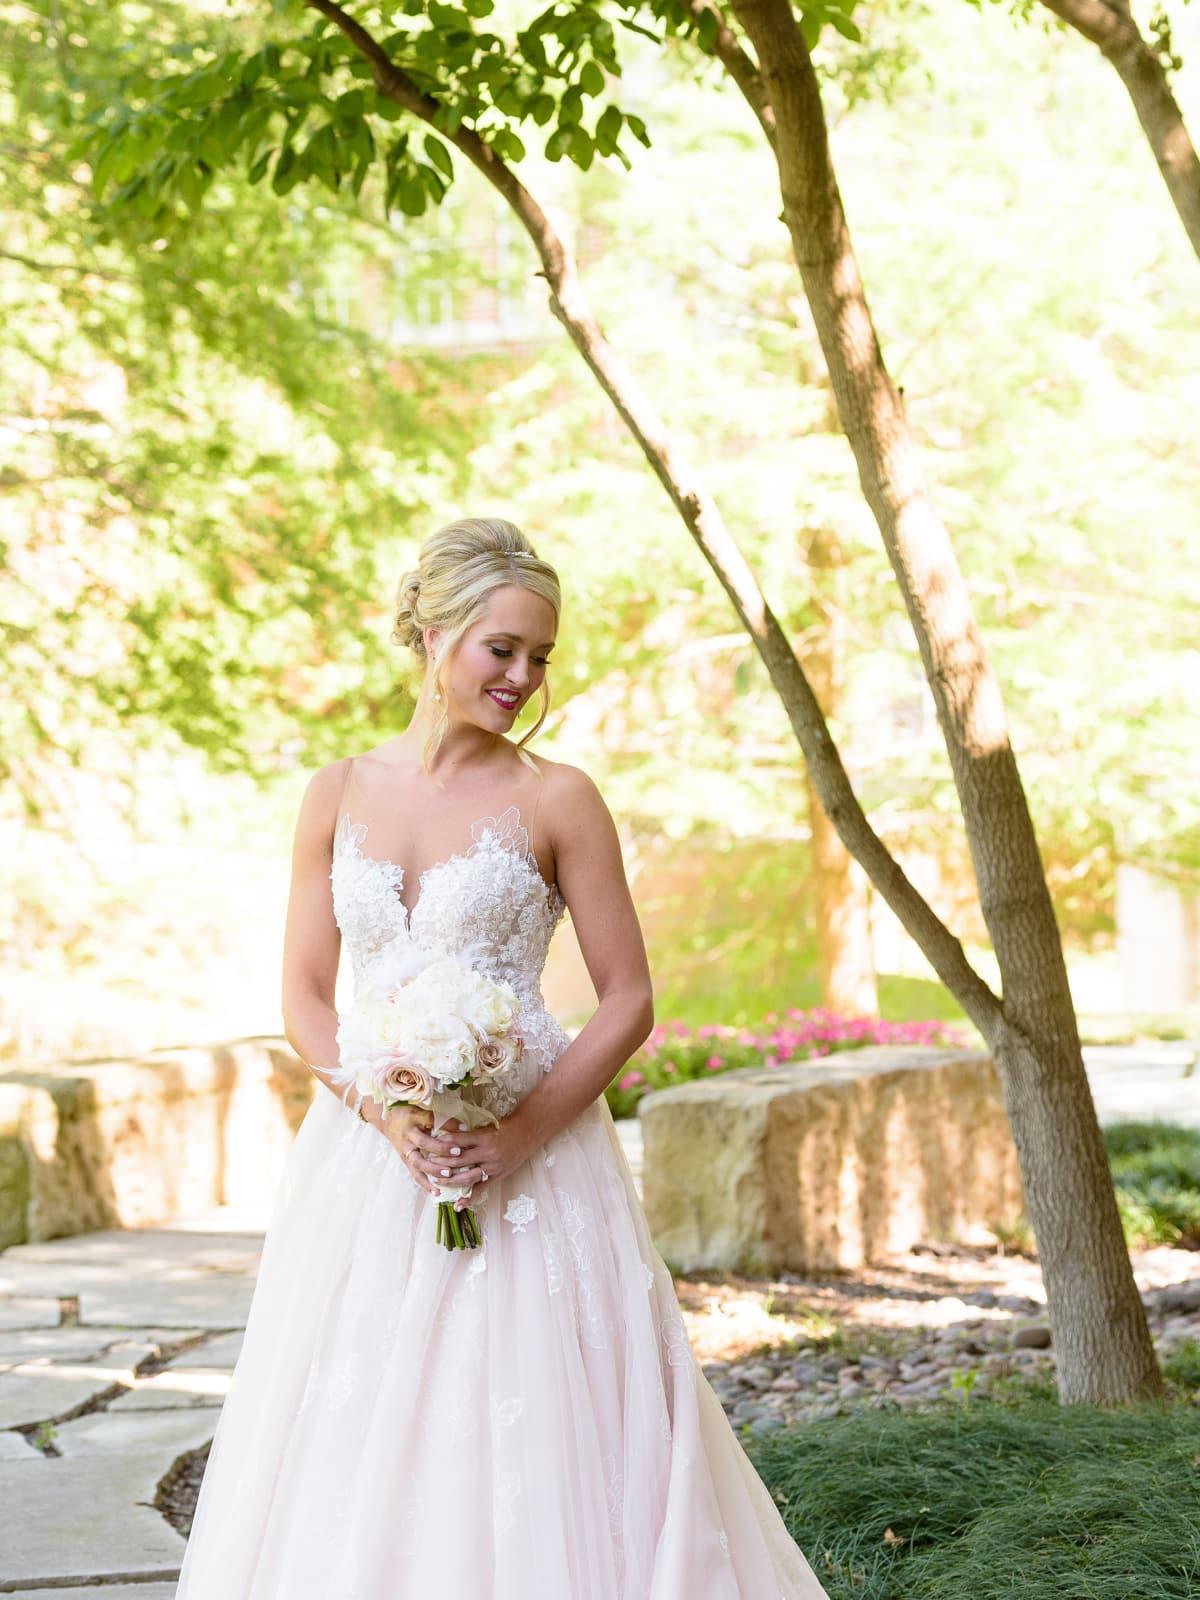 Neely Wedding, Bride